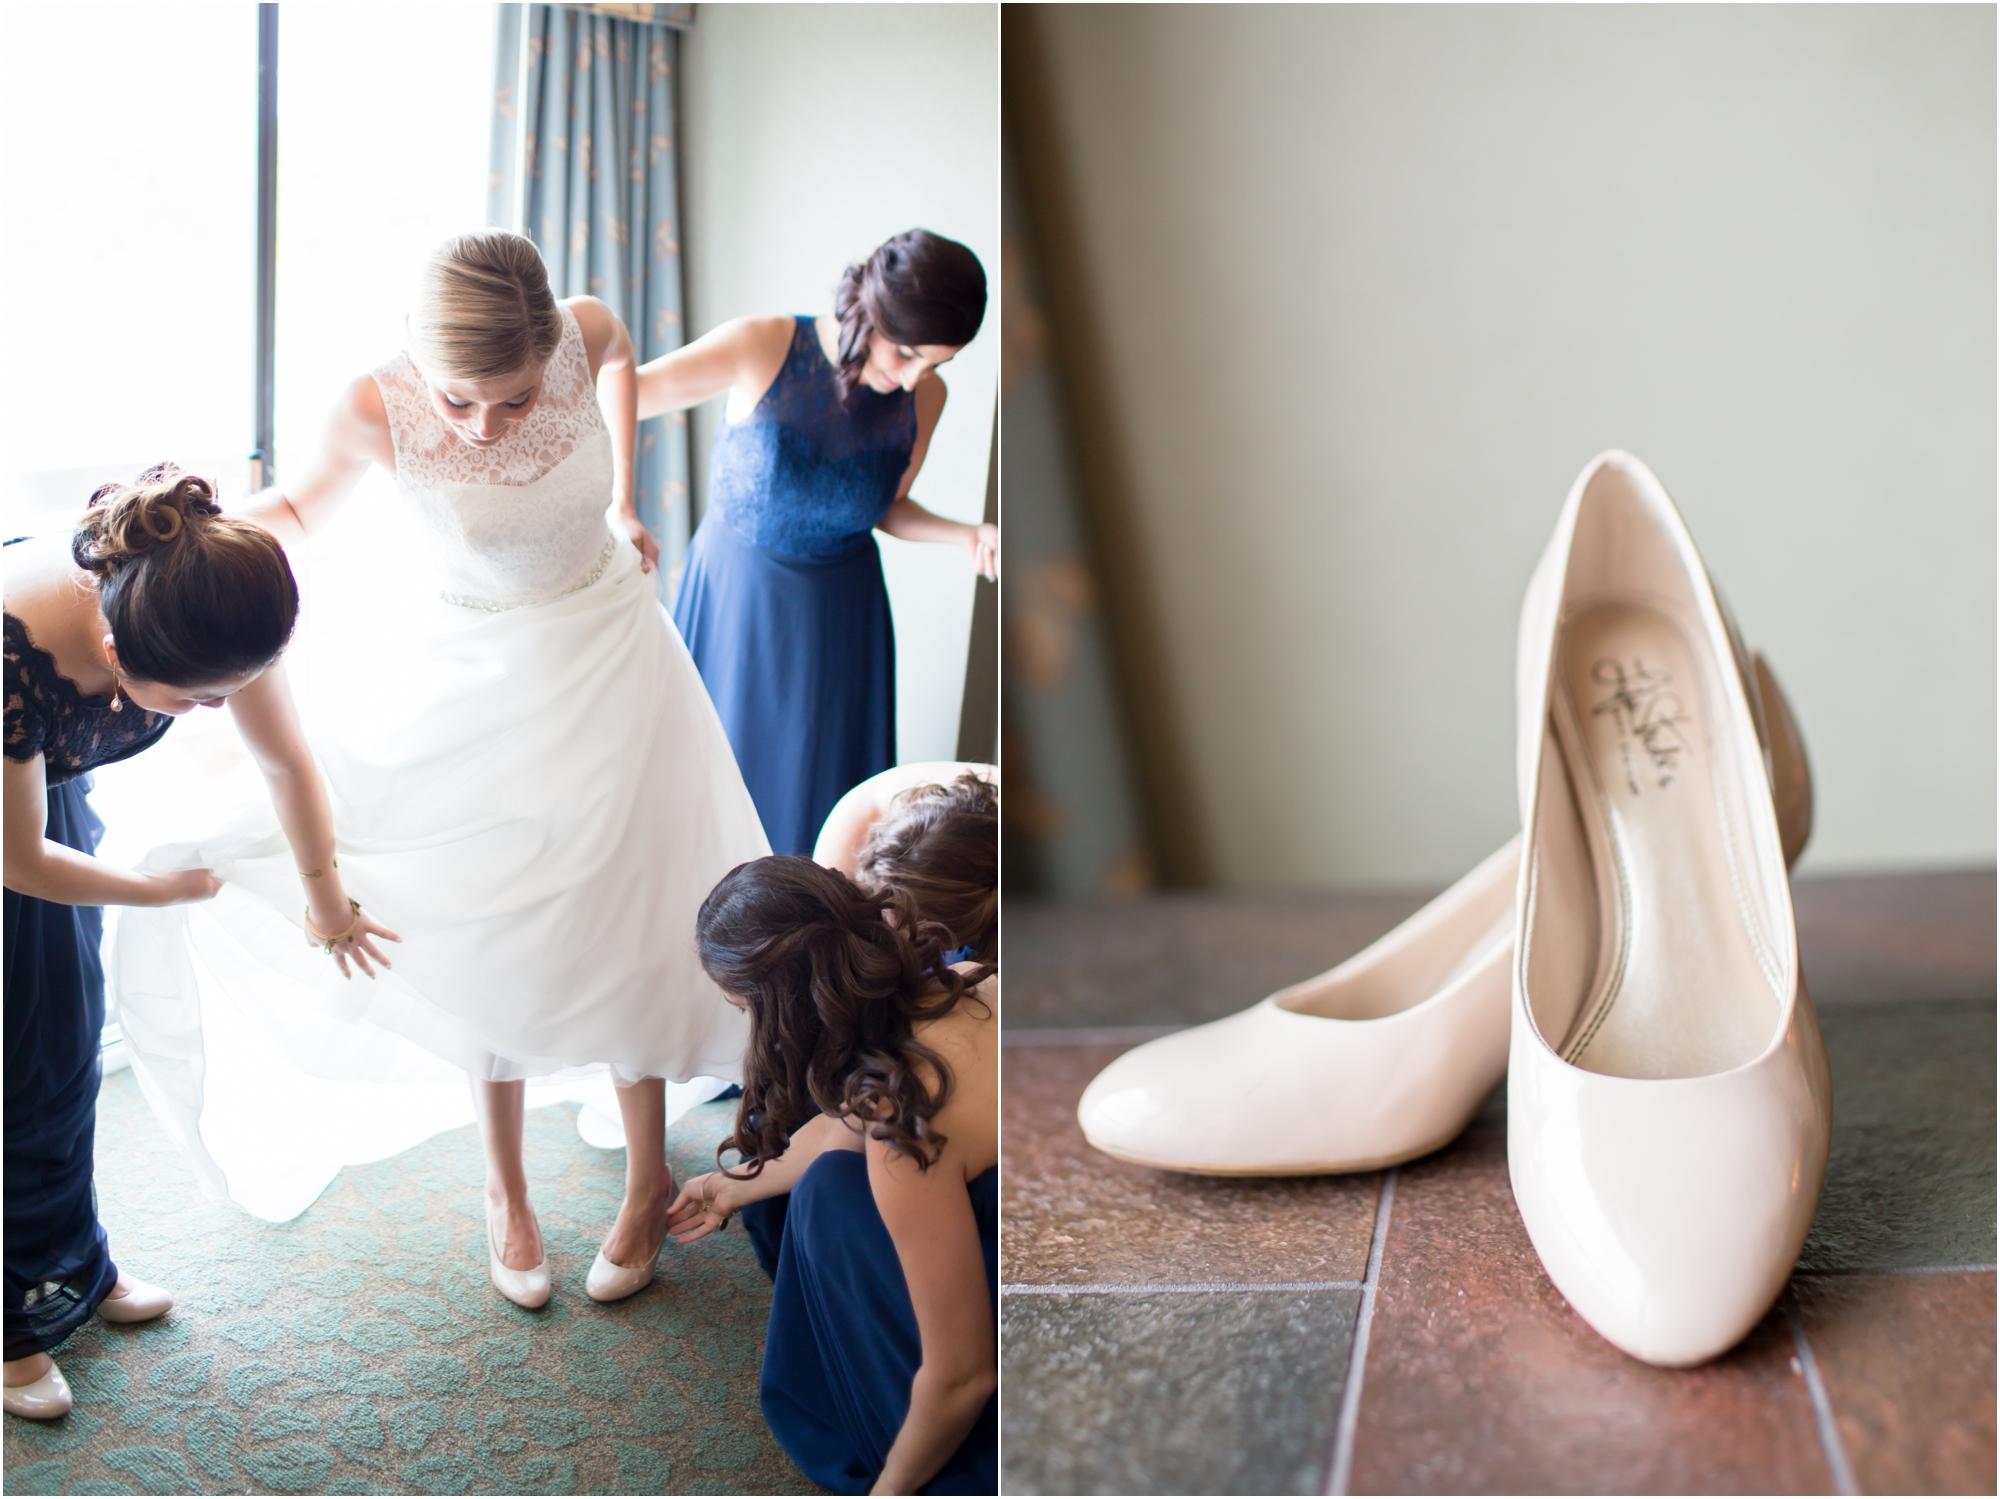 1-Finkel Wedding Getting Ready-130_anna grace photography maryland wedding photographer turf valley.jpg